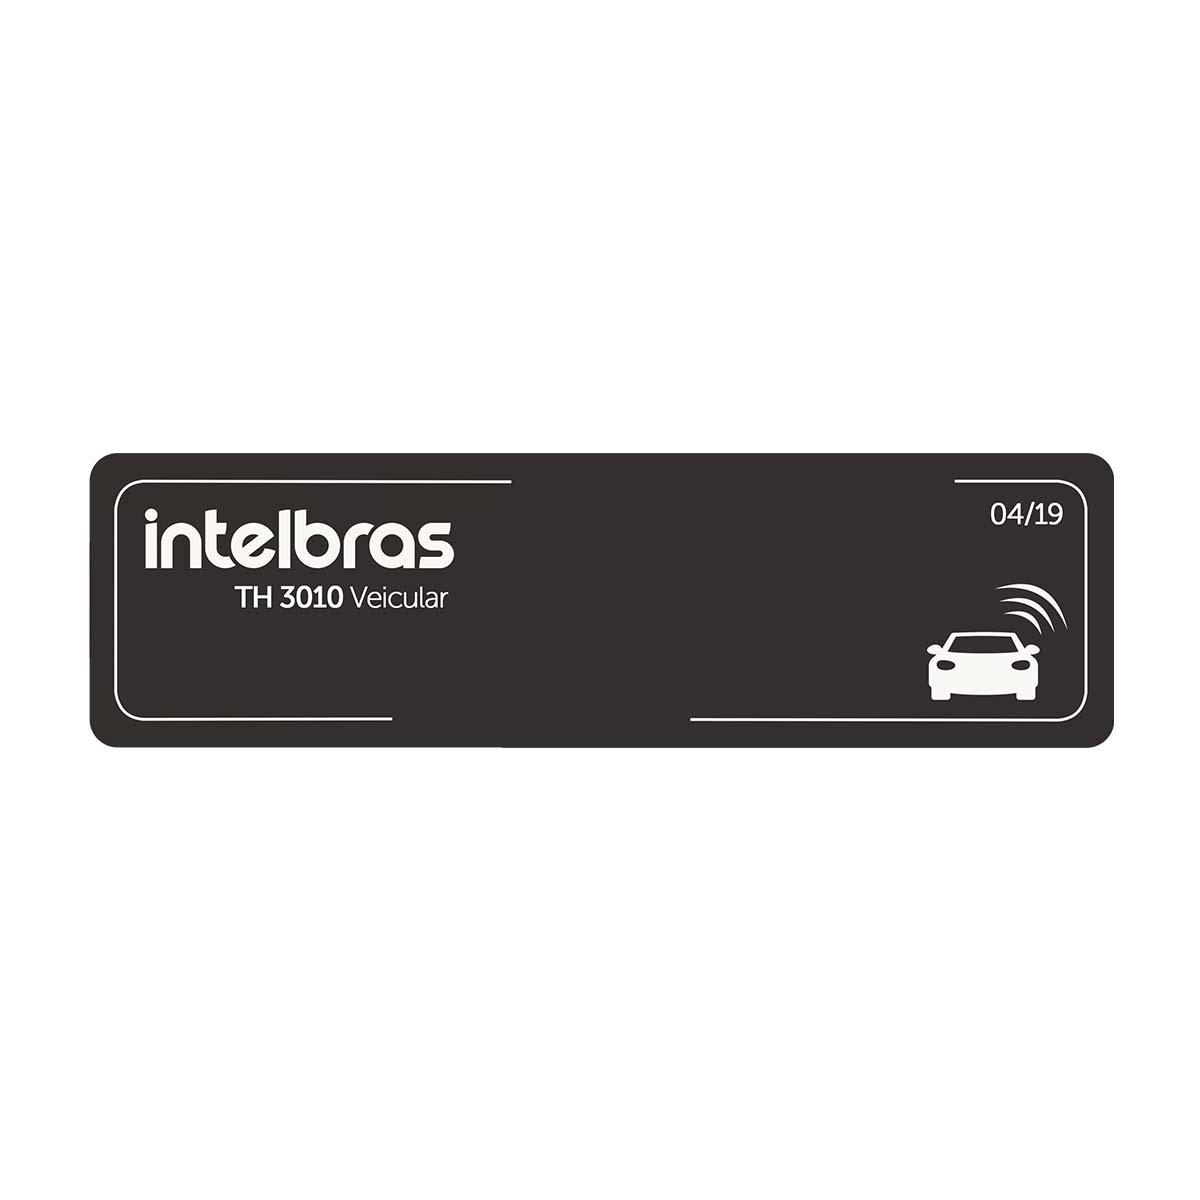 Kit 08 Etiqueta Veicular Intelbras Rfid 900mhz Th 3010